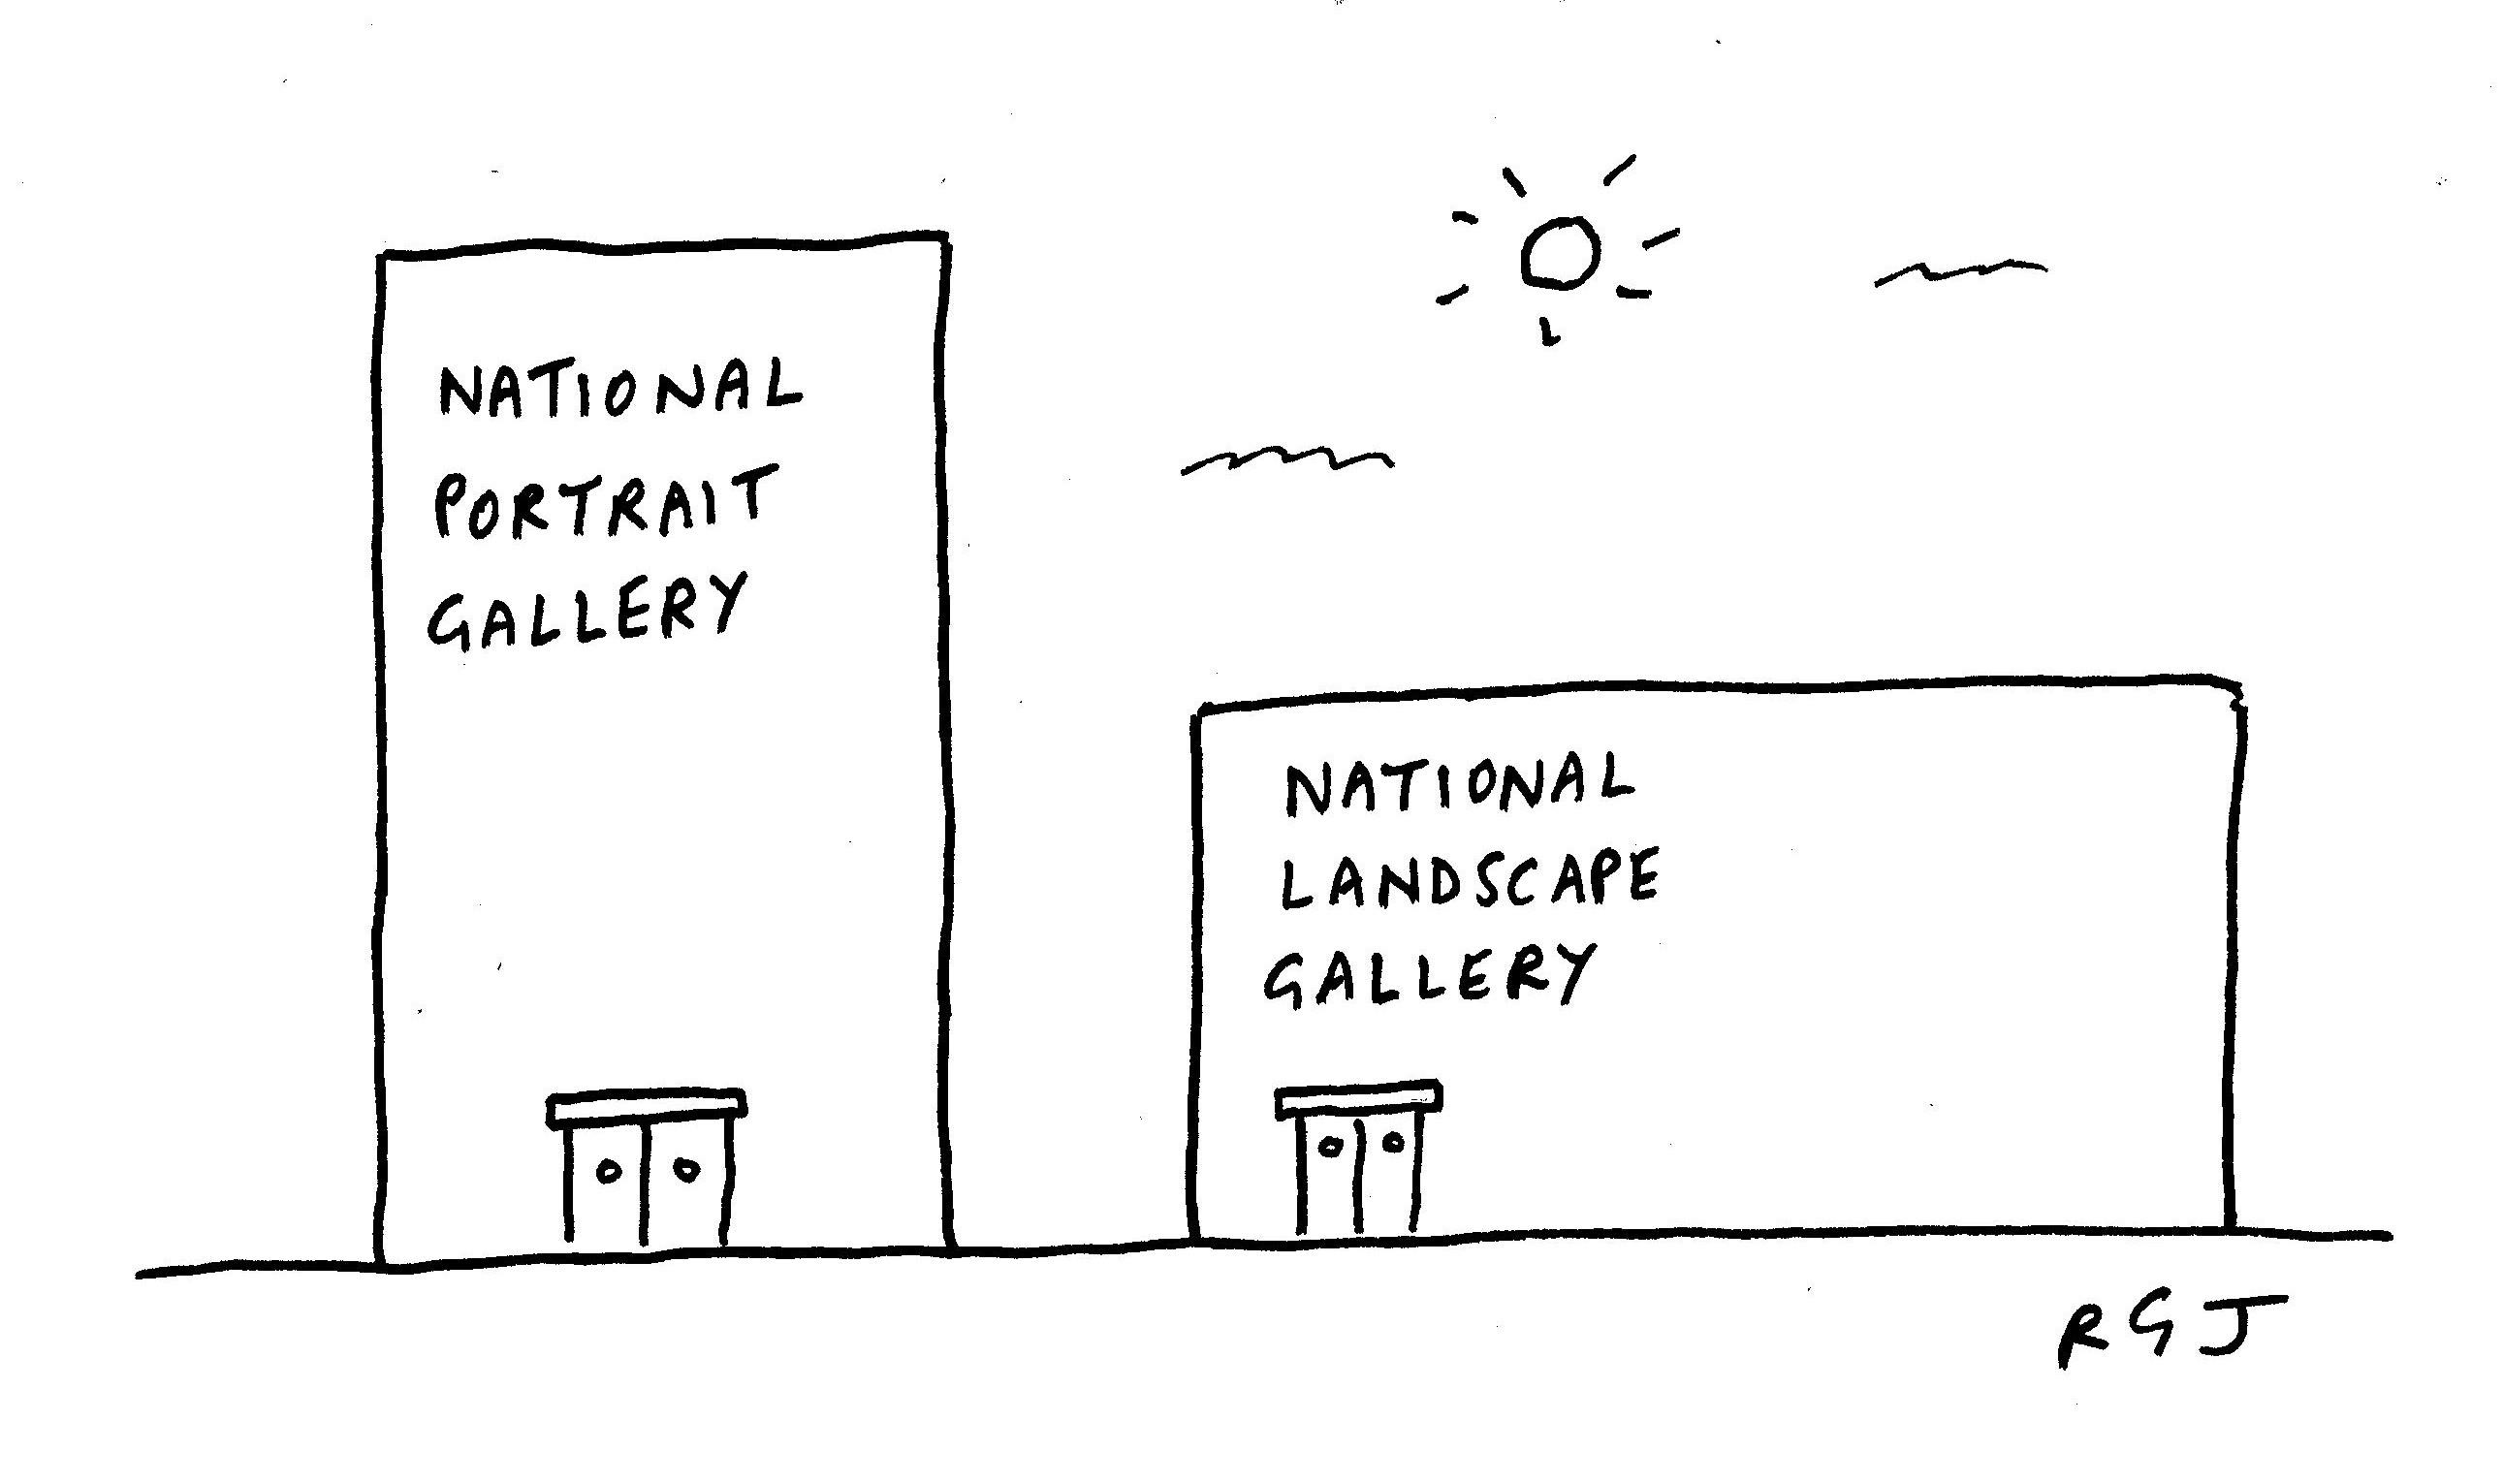 portraitgallery